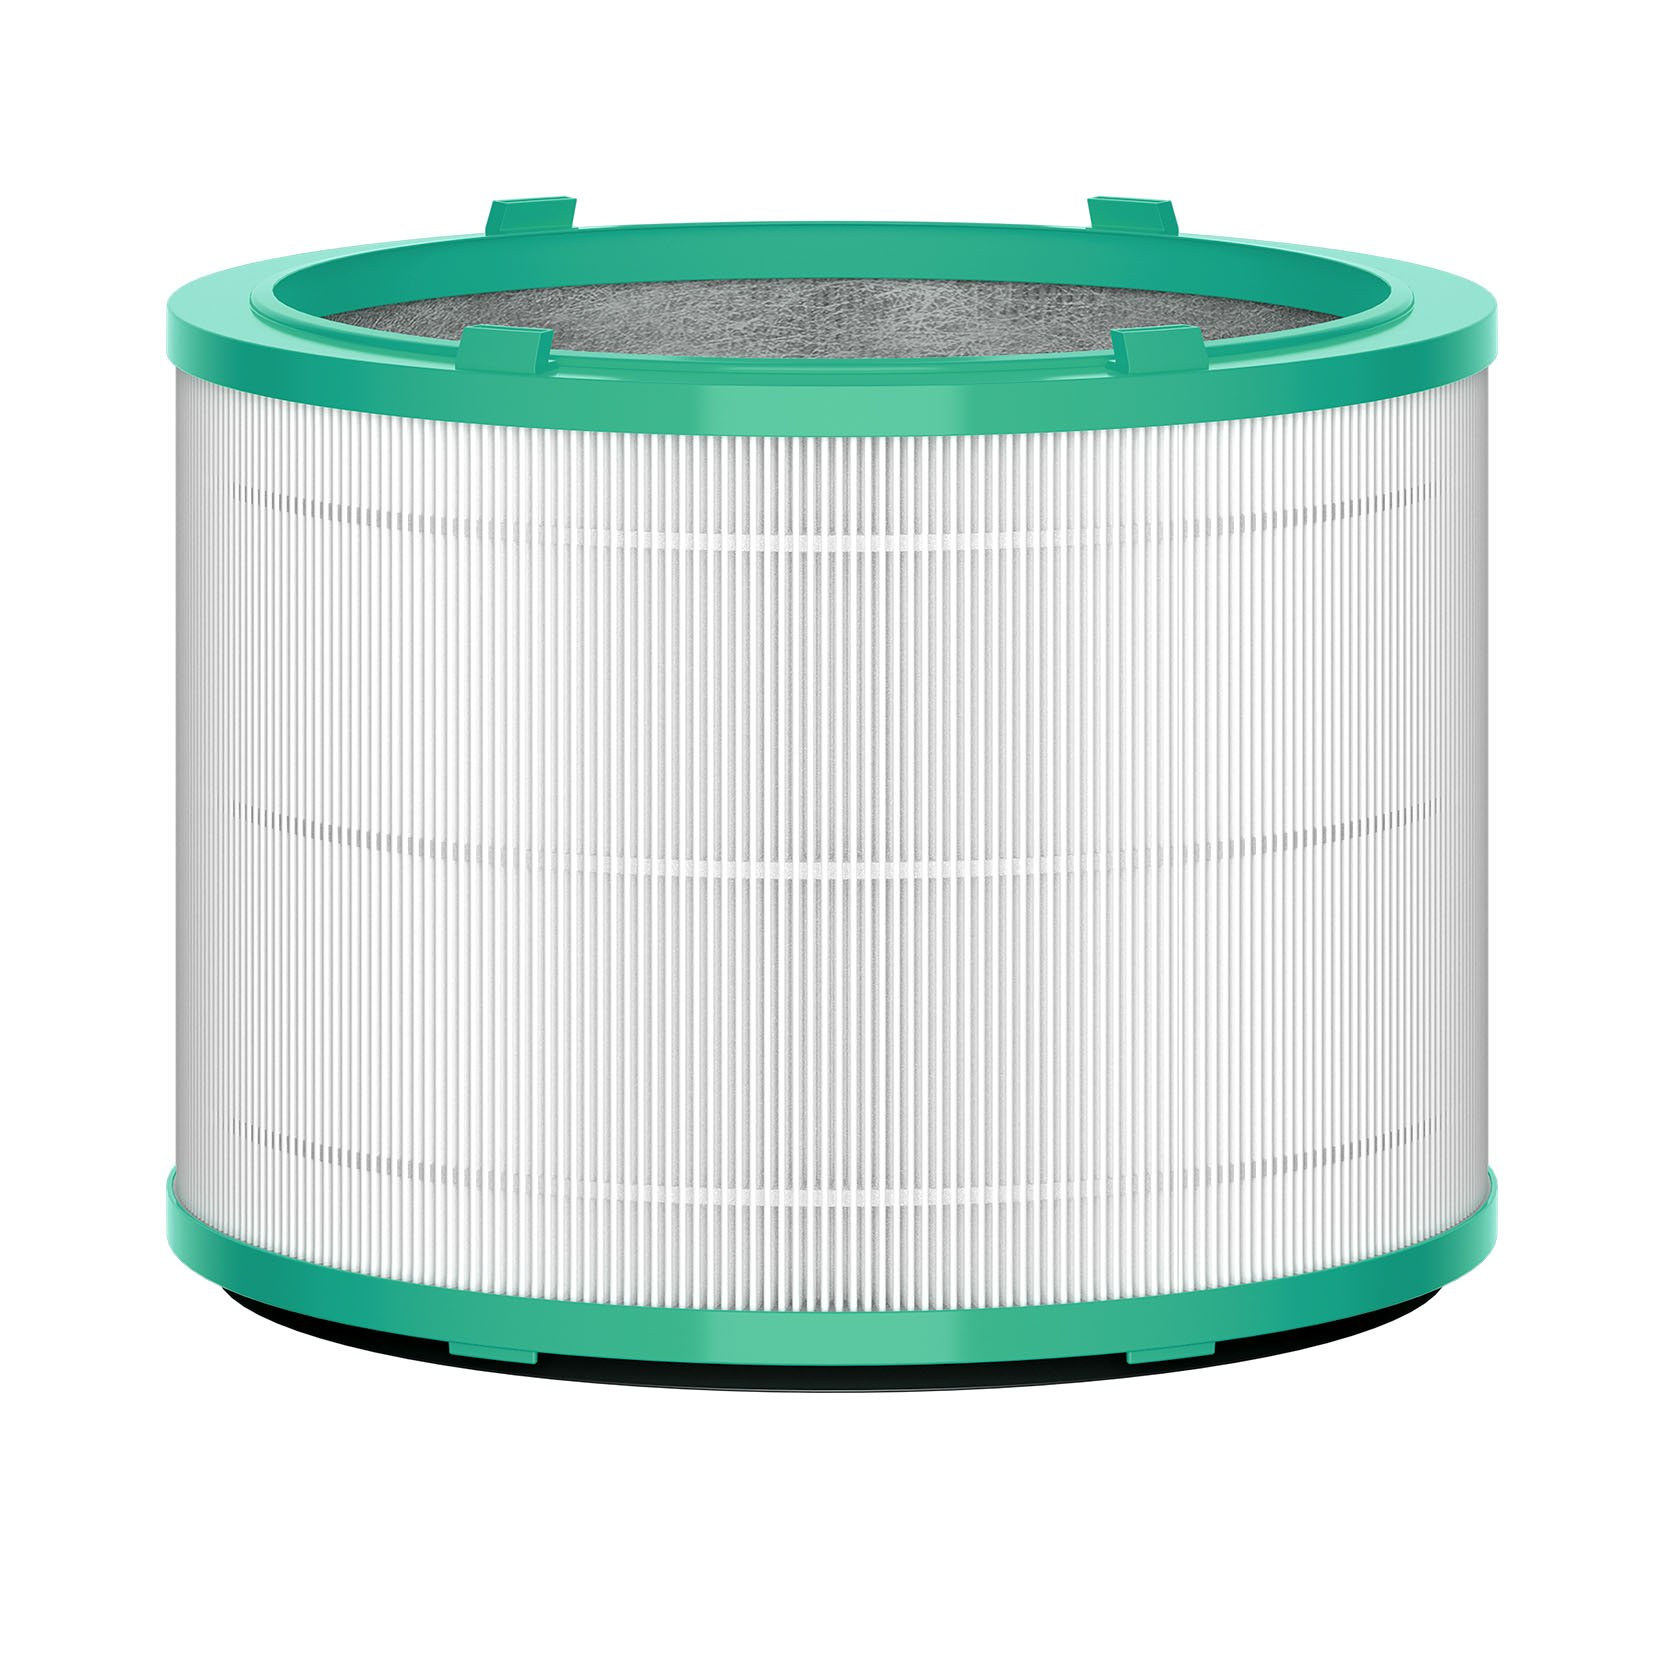 Dyson Desk Purifier Replacement Filter